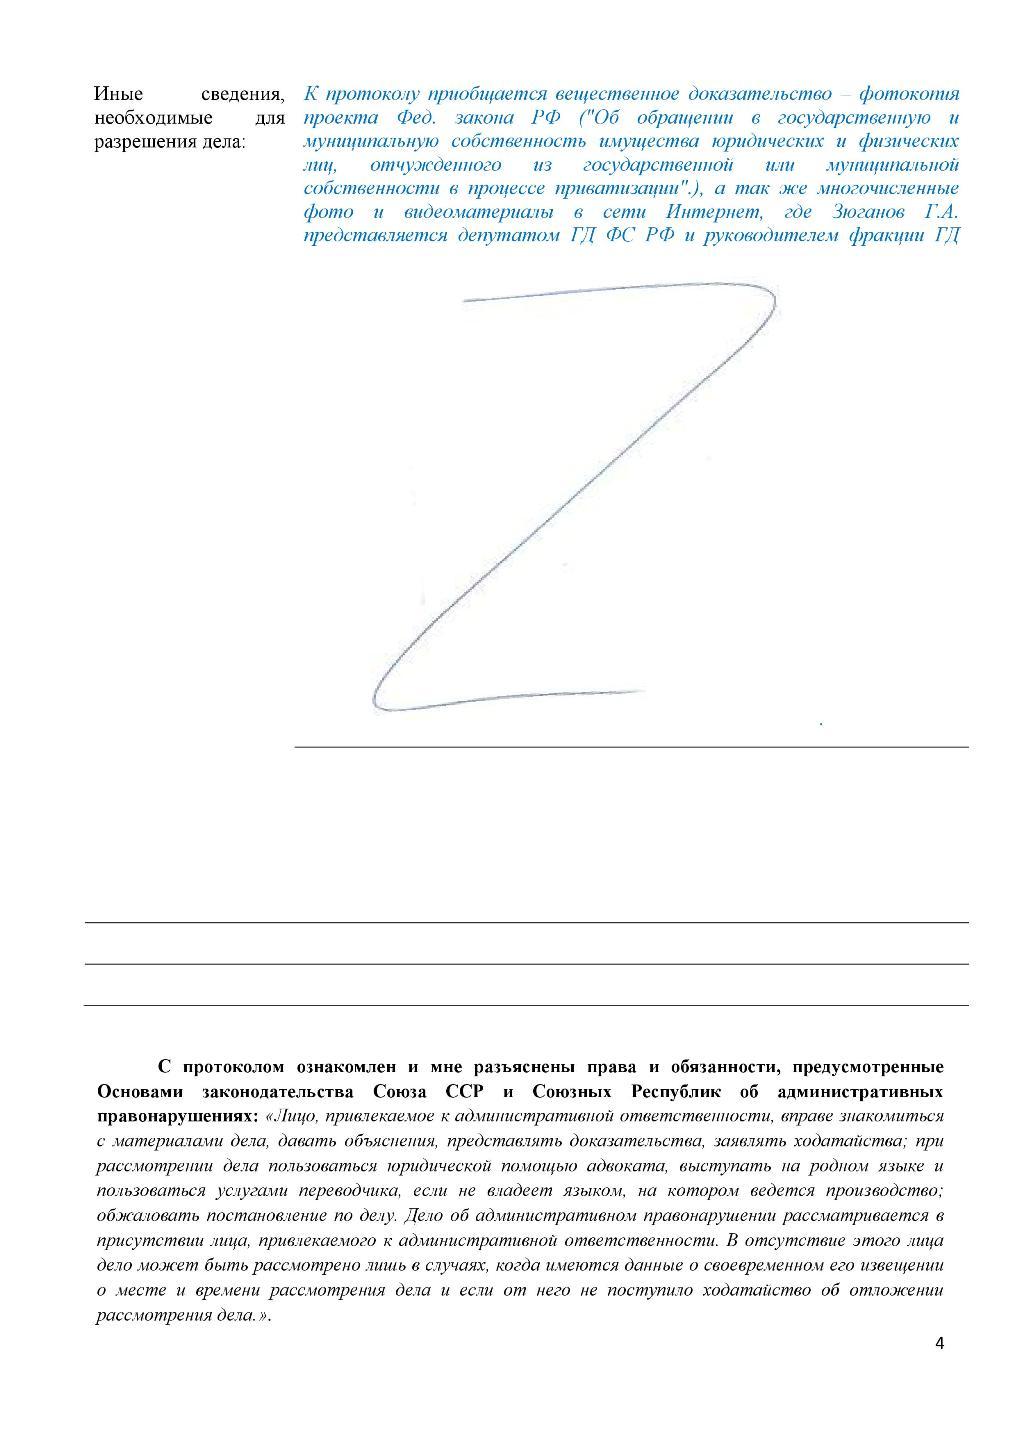 http://narsud-sssr.ru/wp-content/uploads/2015/08/page4.jpg